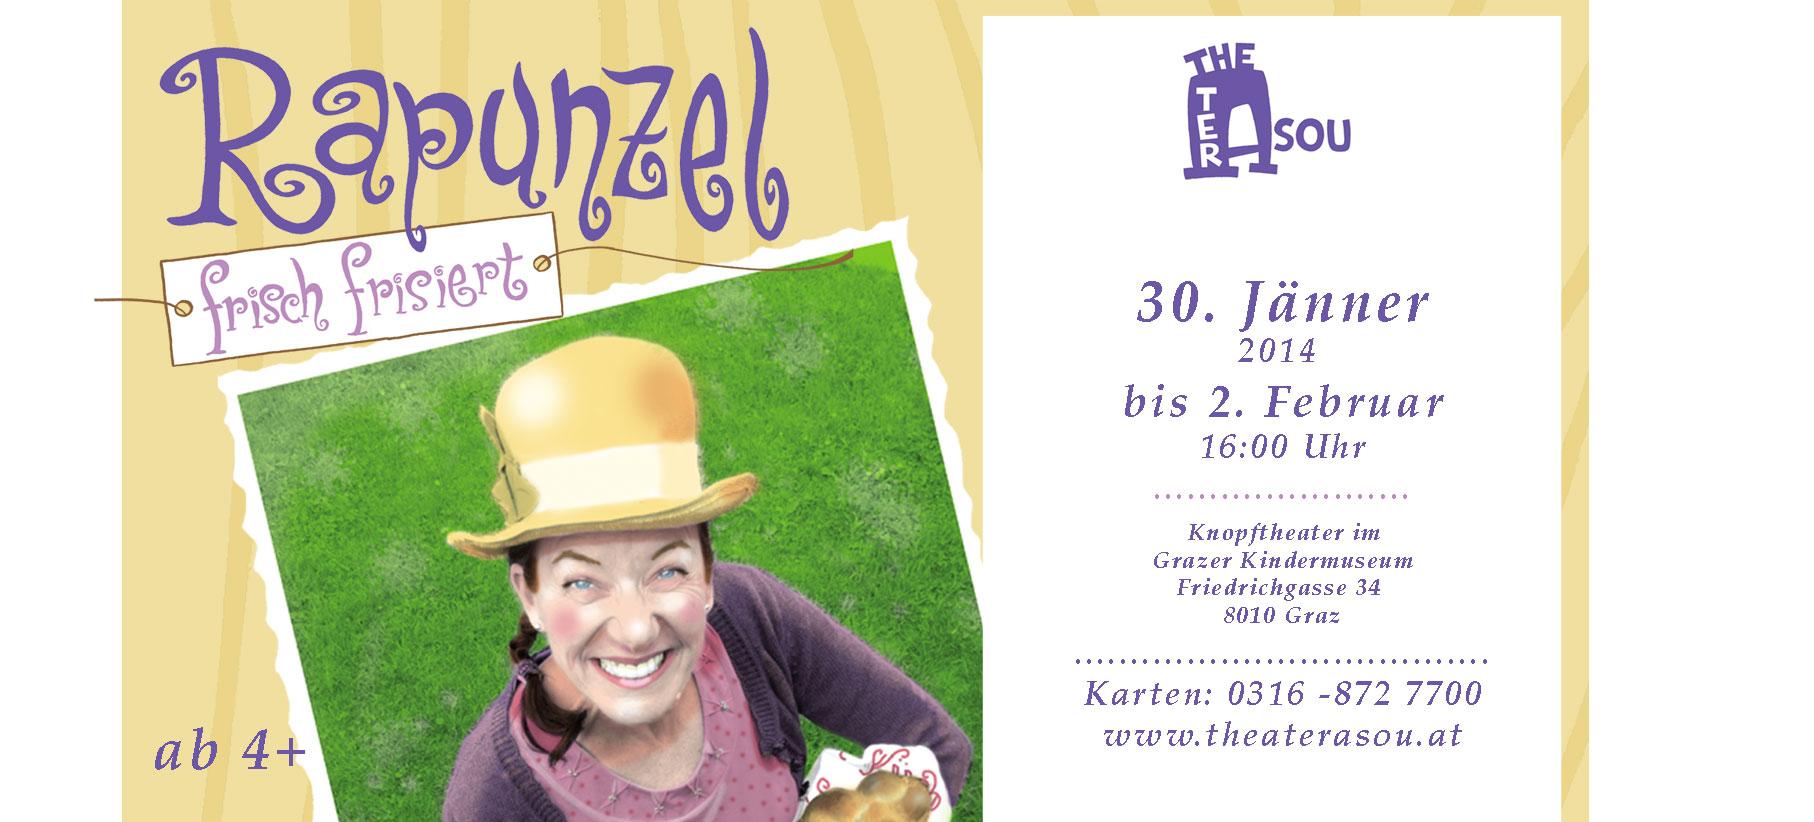 Rapunzel frisch frisiert im Knopftheater Graz